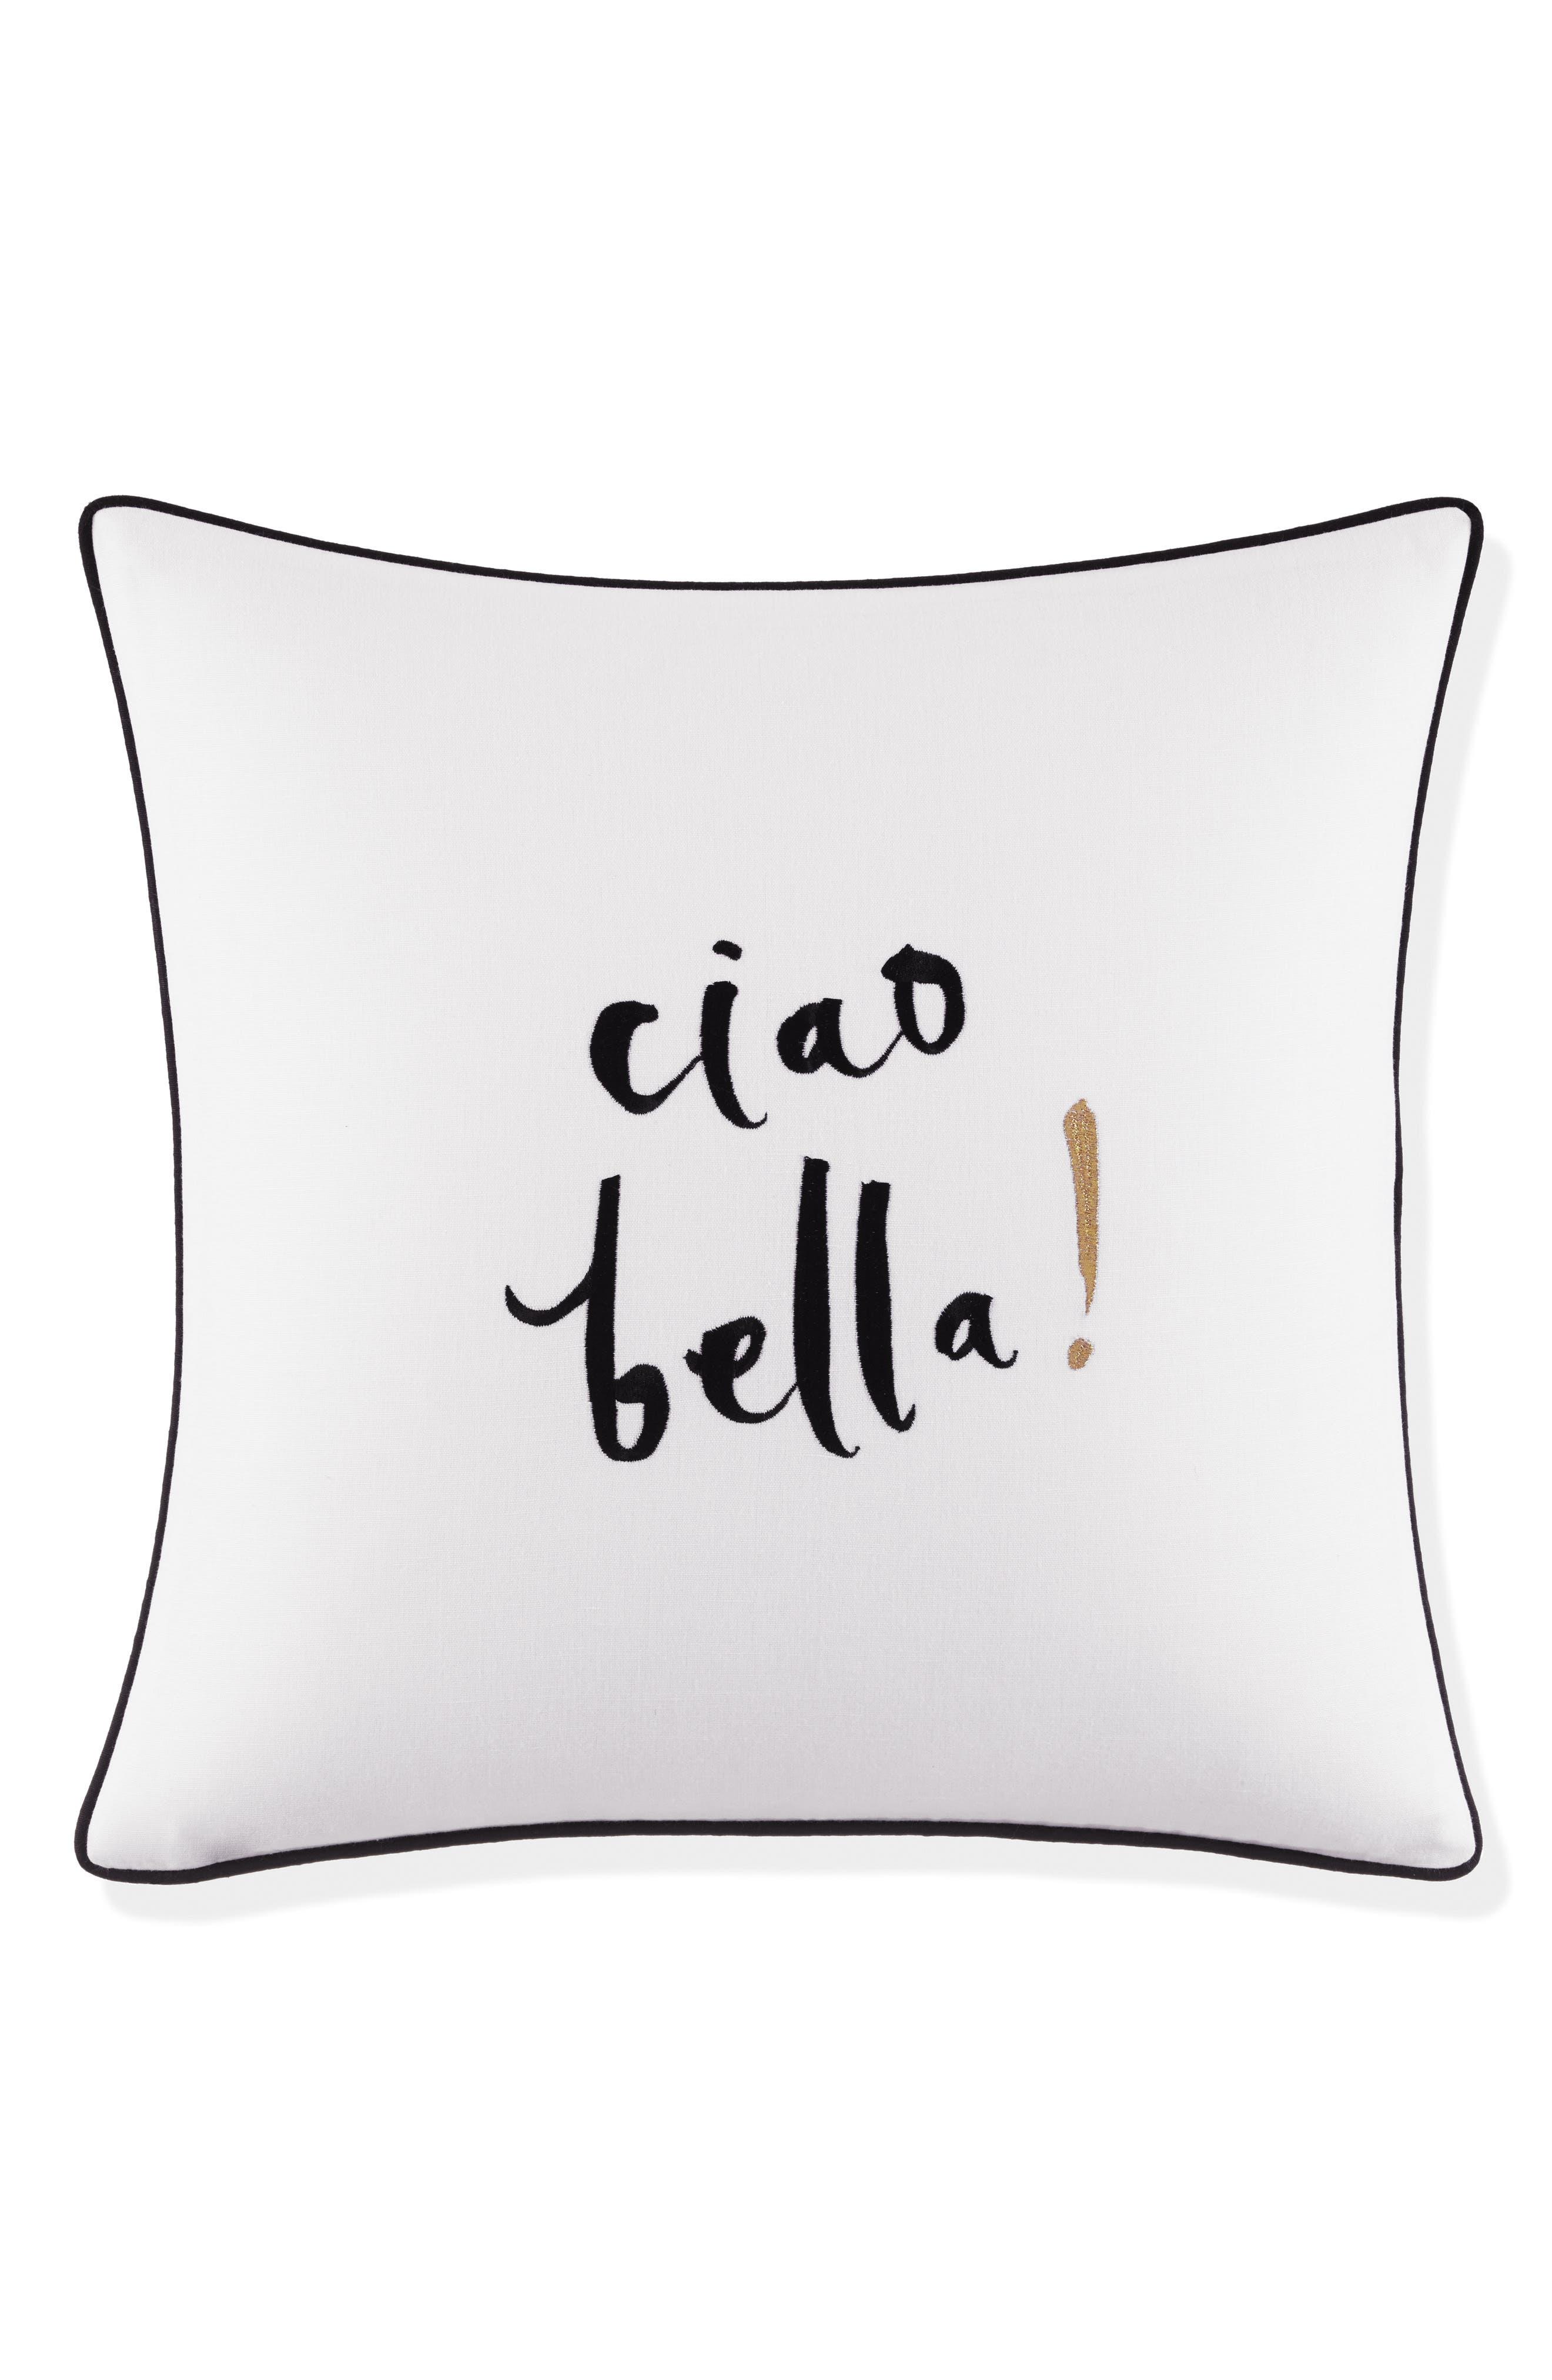 ciao bella pillow,                             Main thumbnail 1, color,                             100